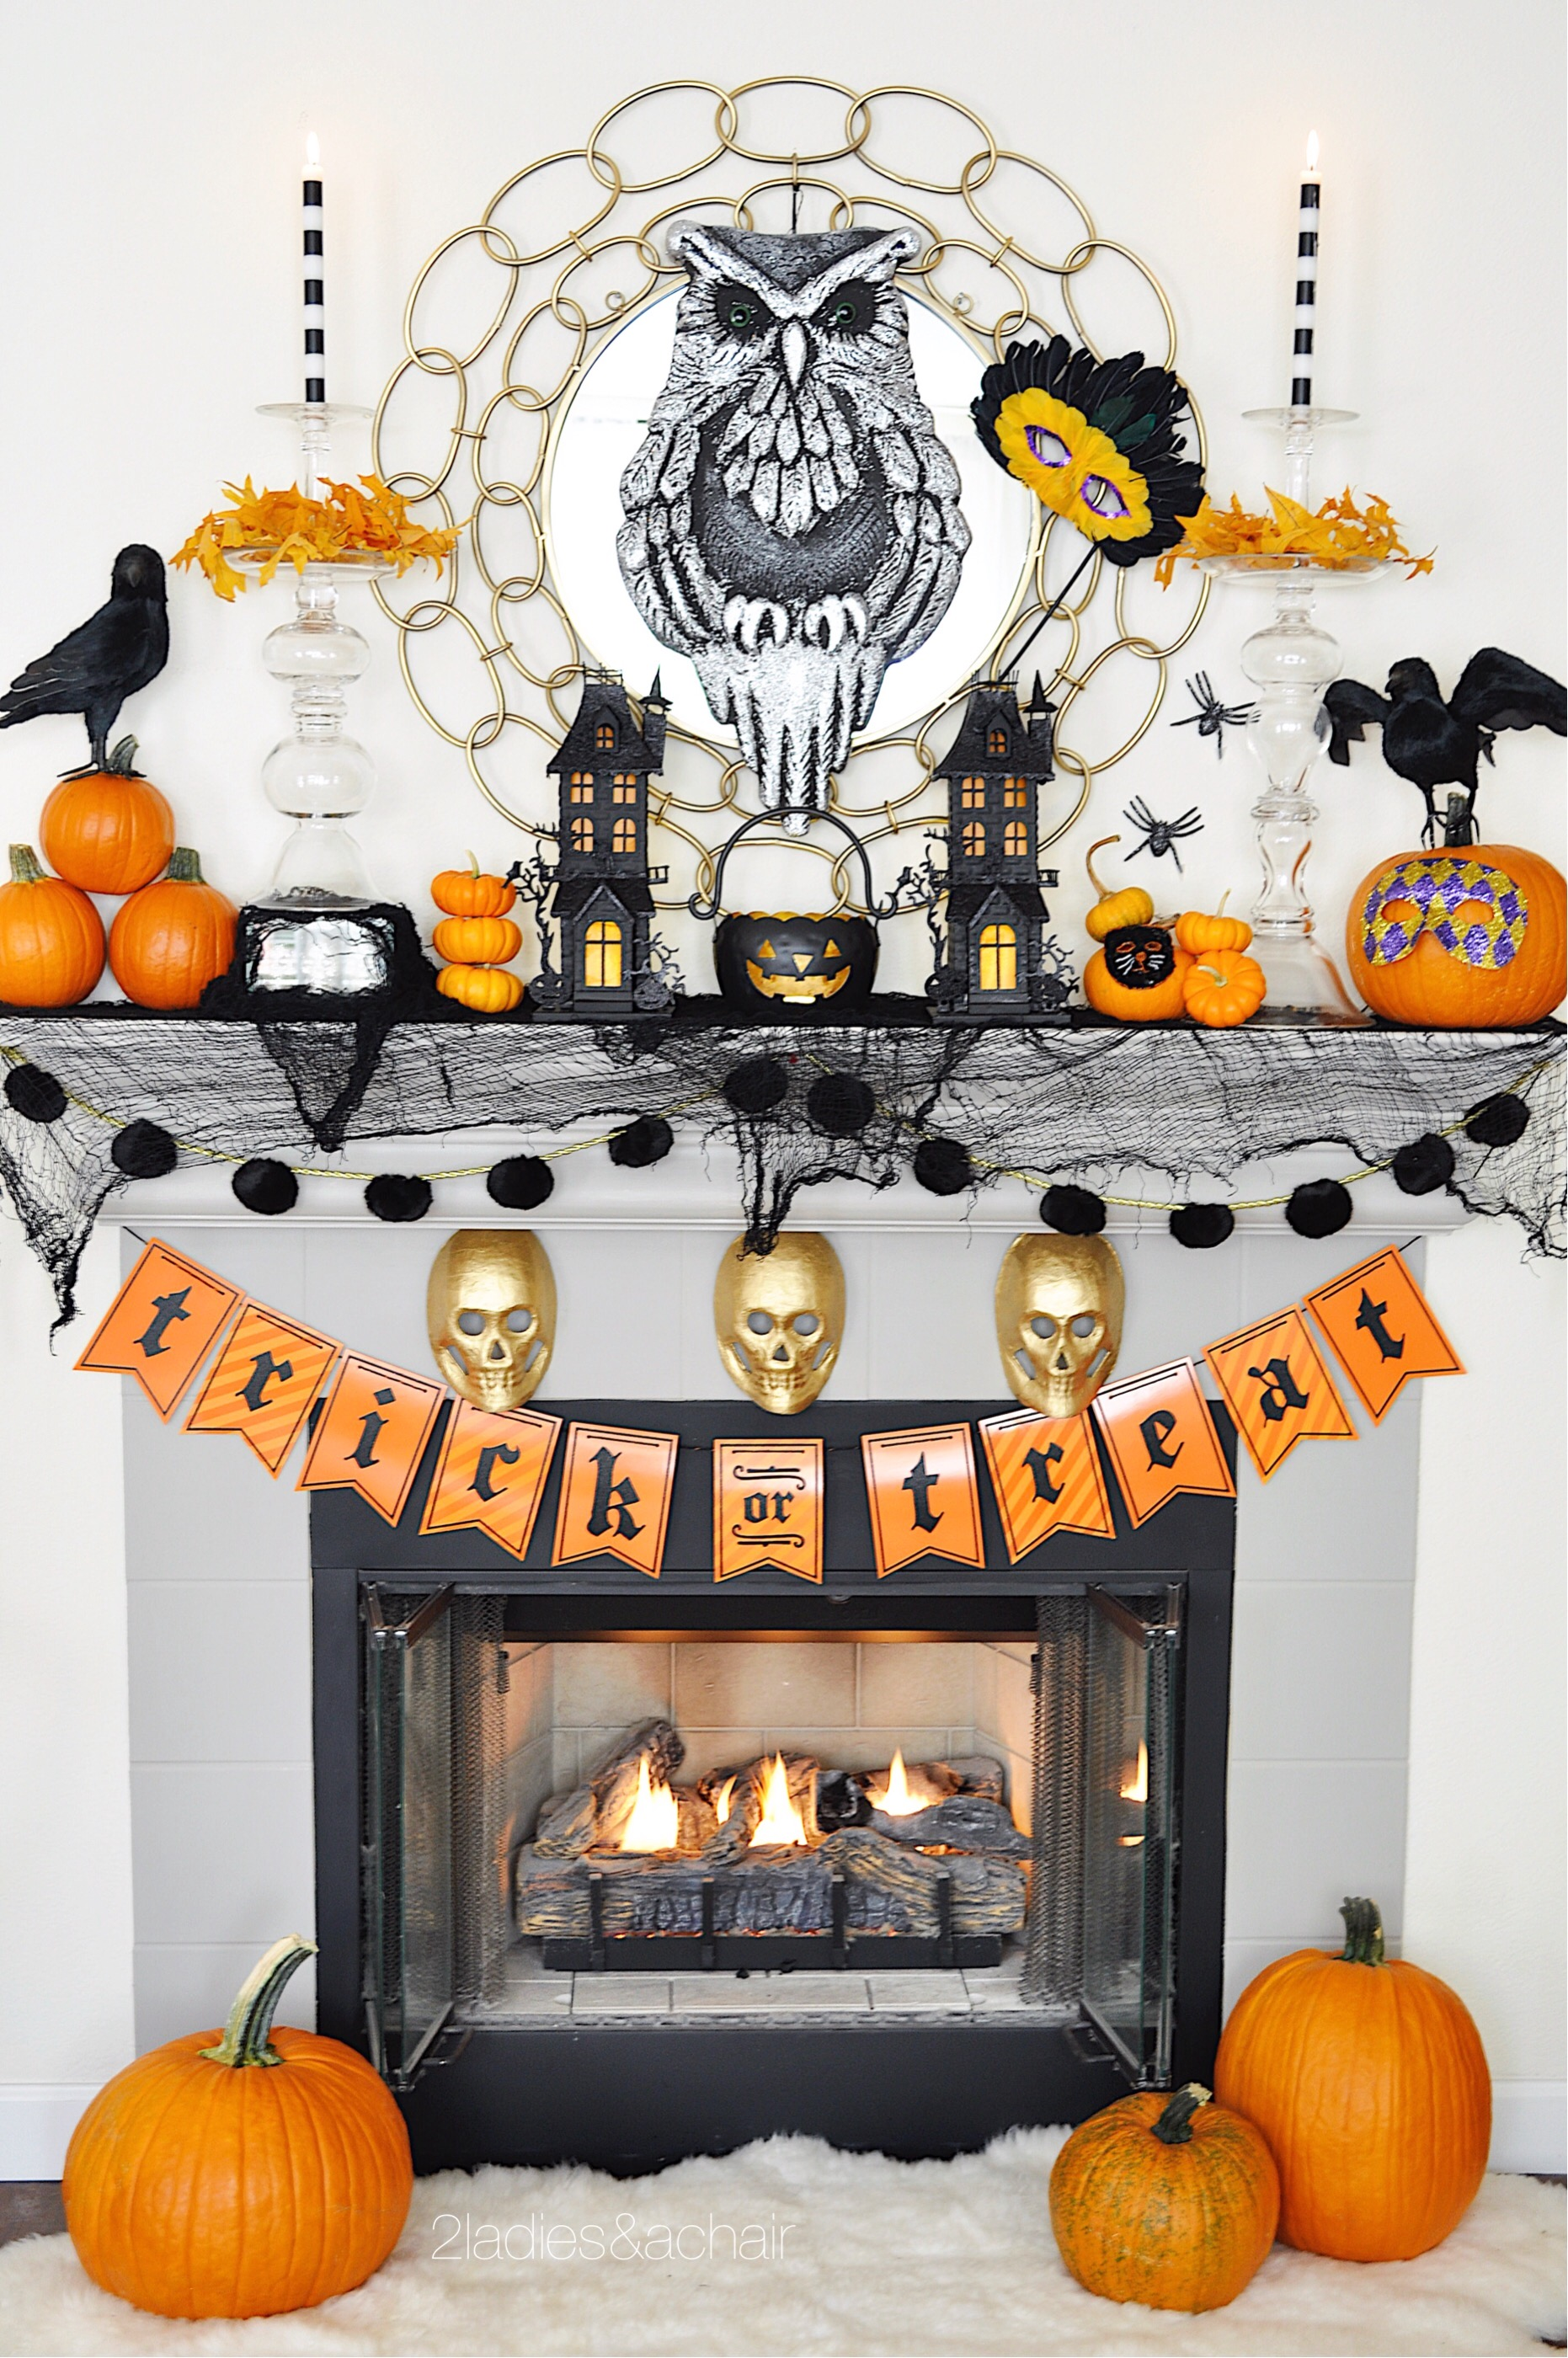 halloween mantel decorations FullSizeRender(79).jpg